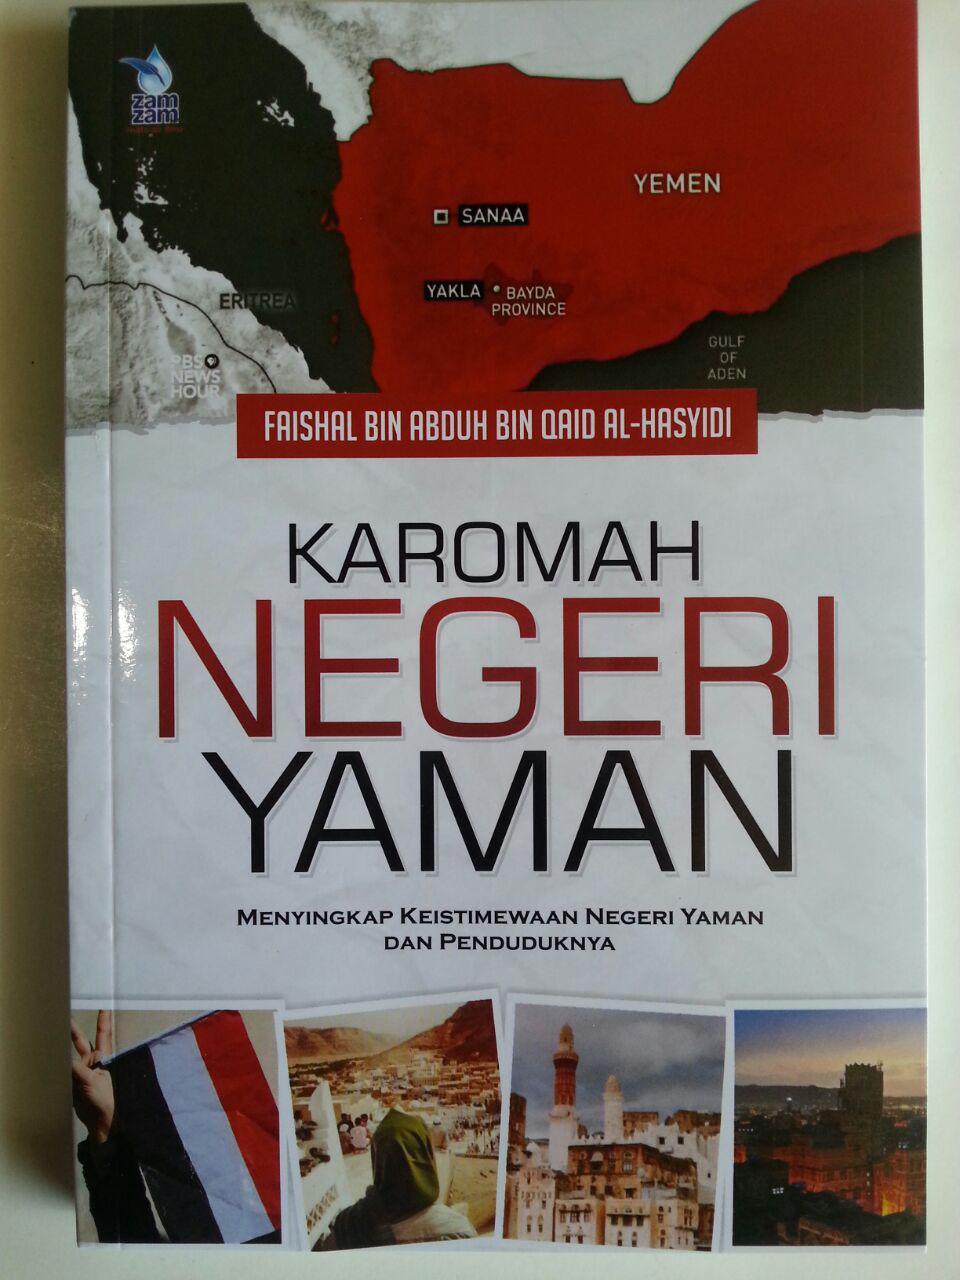 Buku Karomah Negeri Yaman Keistimewaan Yaman Dan Penduduknya cover 2